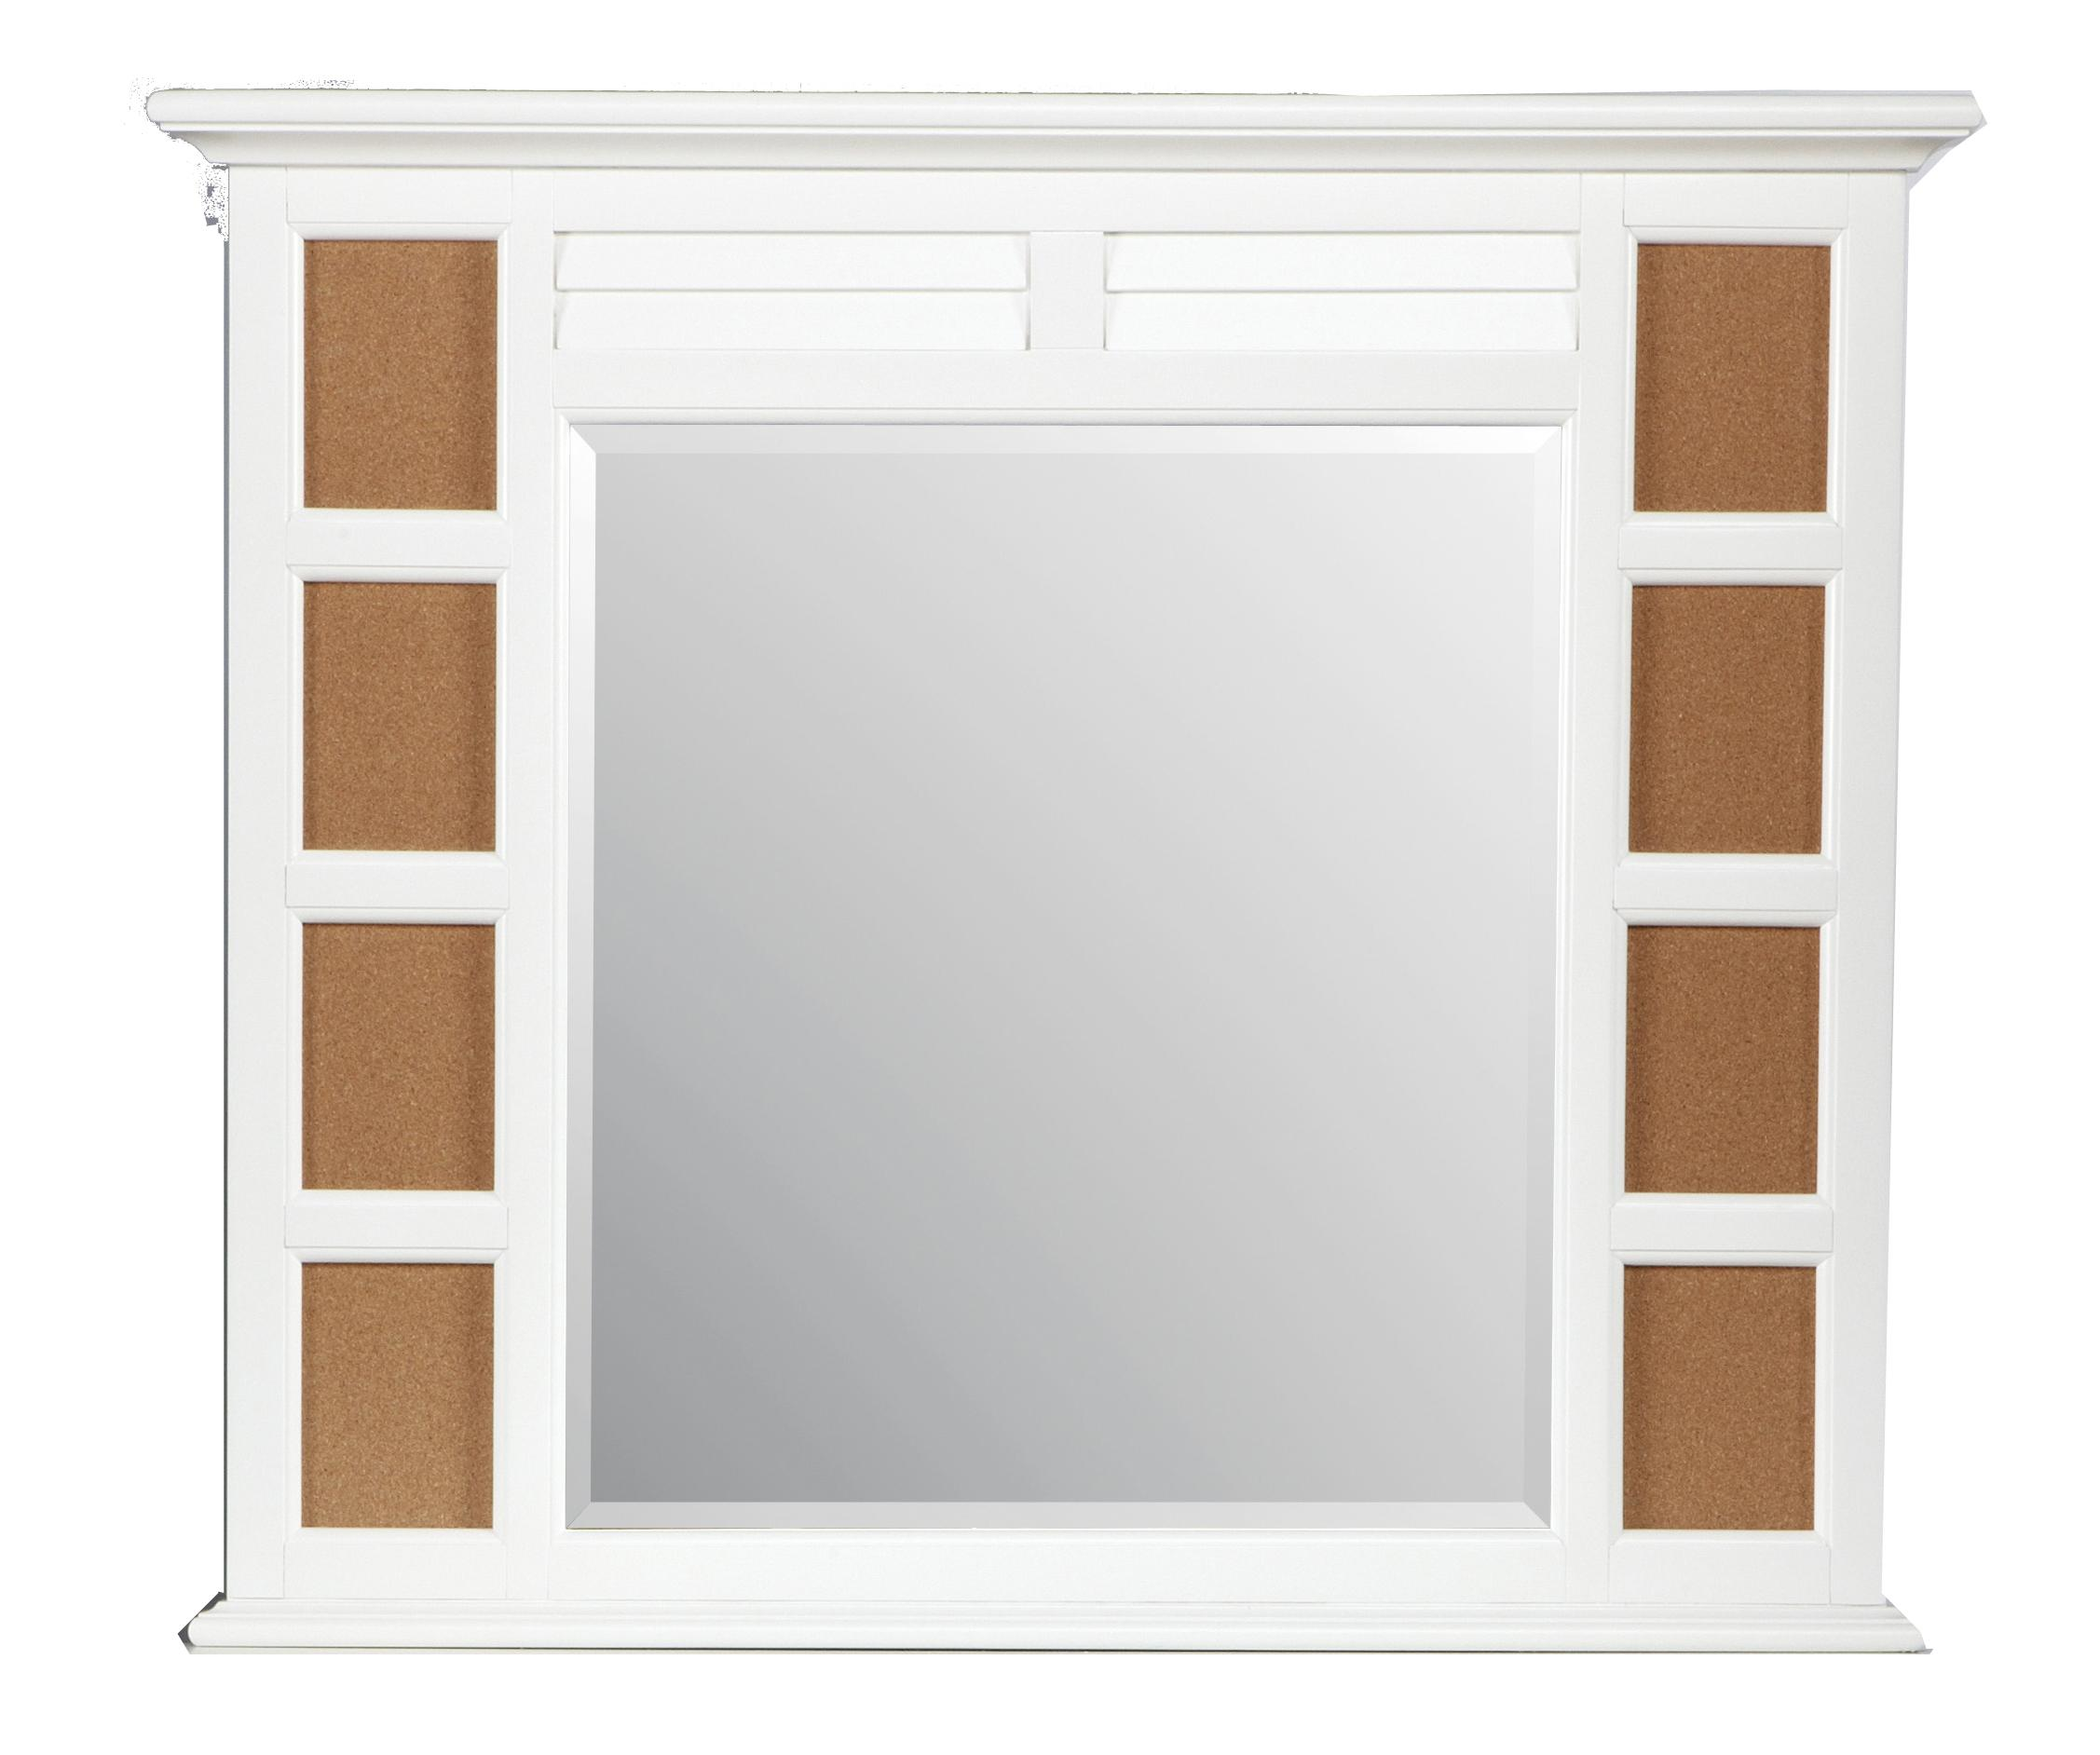 Morris Home Furnishings Berkshire Berkshire Mirror - Item Number: 2697-02